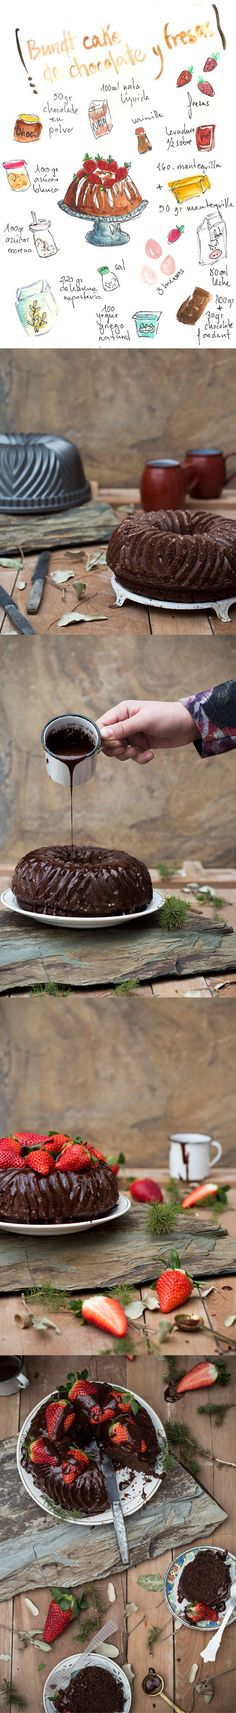 Bundt Cake de chocolate y fresas / http://www.gastroandalusi.com